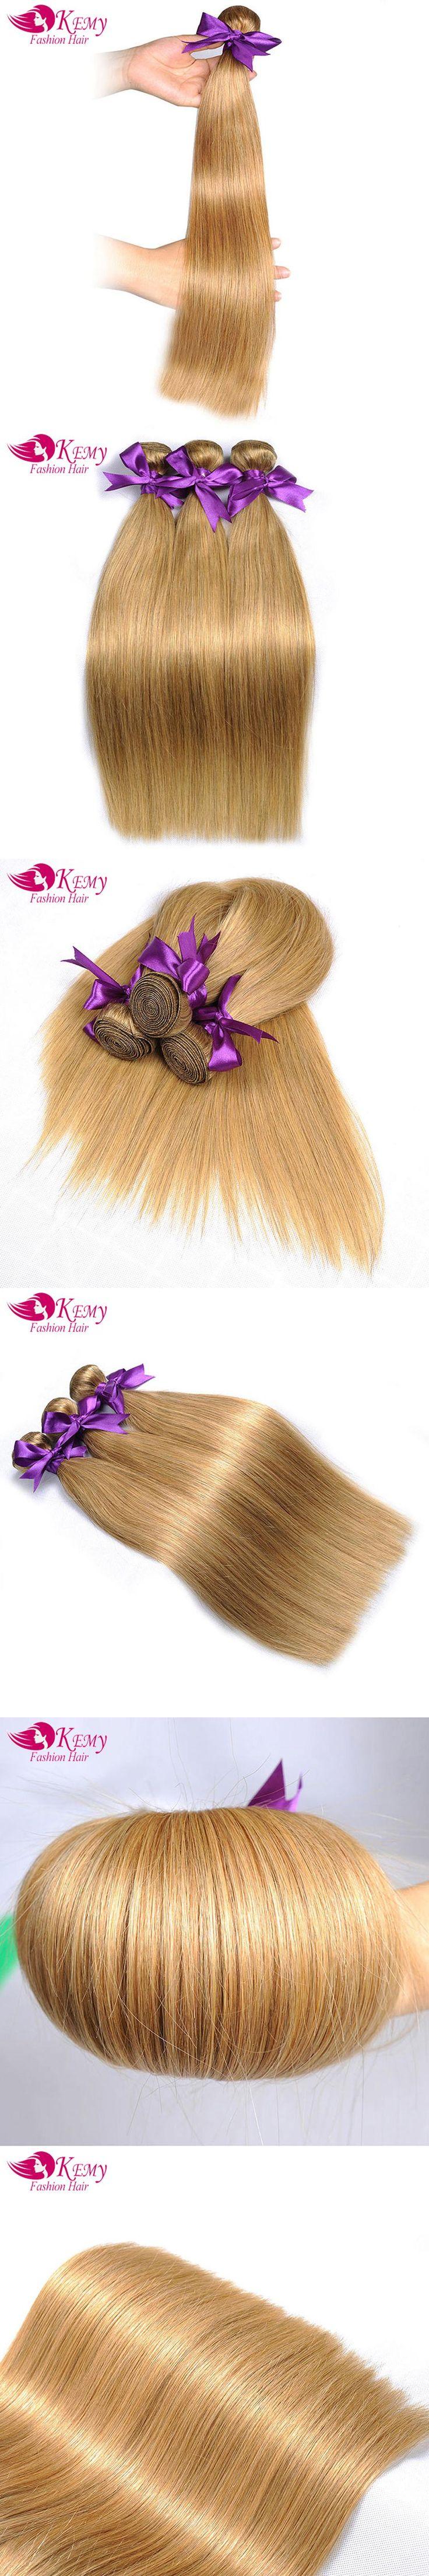 KEMY Remy Hair bundles Brazilian Straight Hair Weave 3Pcs Lot light brown Colored Salon Hair 27# Low Ratio longest Hair PP 15%